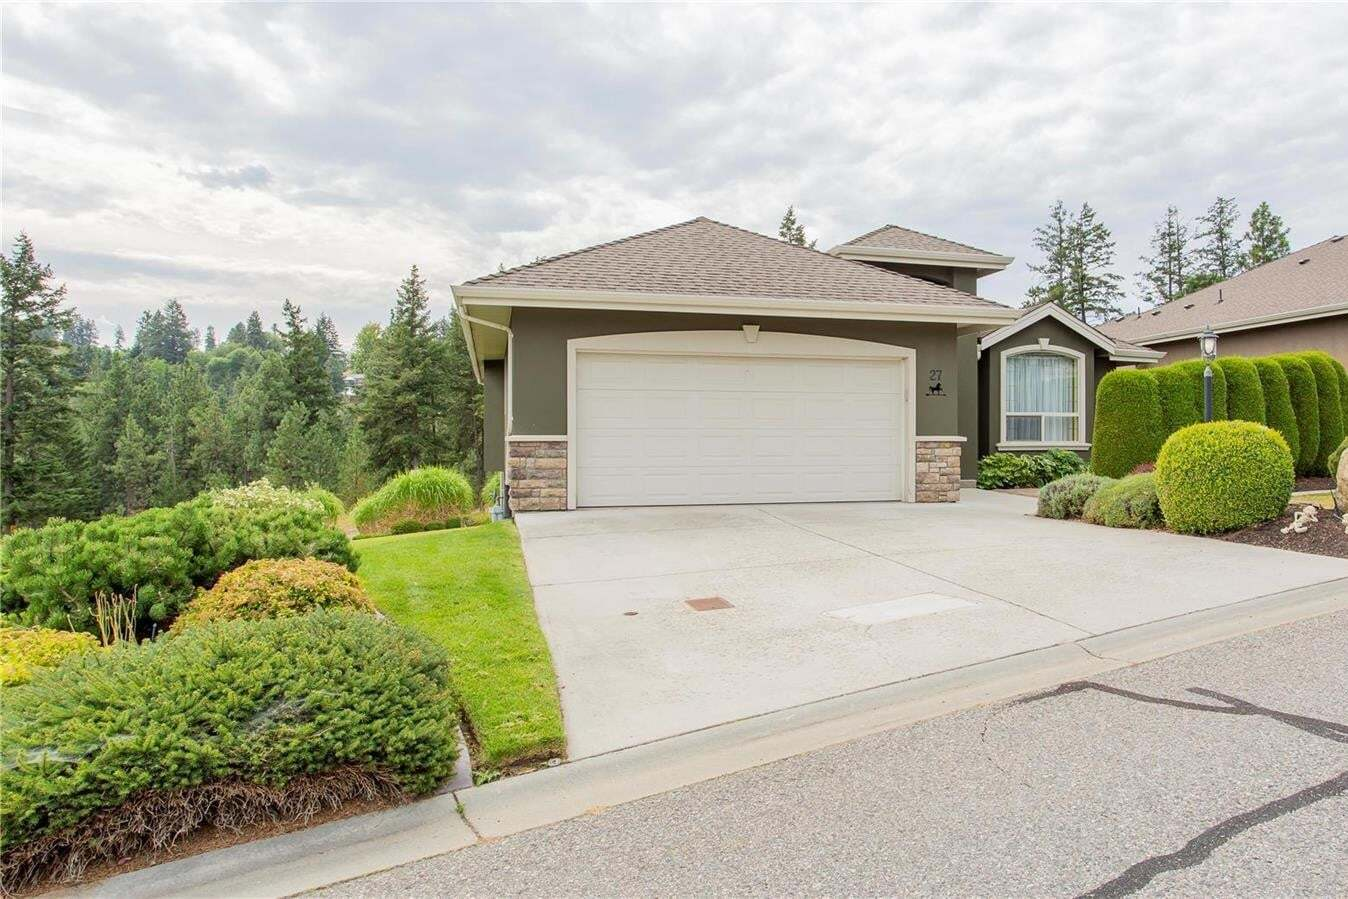 House for sale at 2155 Horizon Dr West Kelowna British Columbia - MLS: 10214385